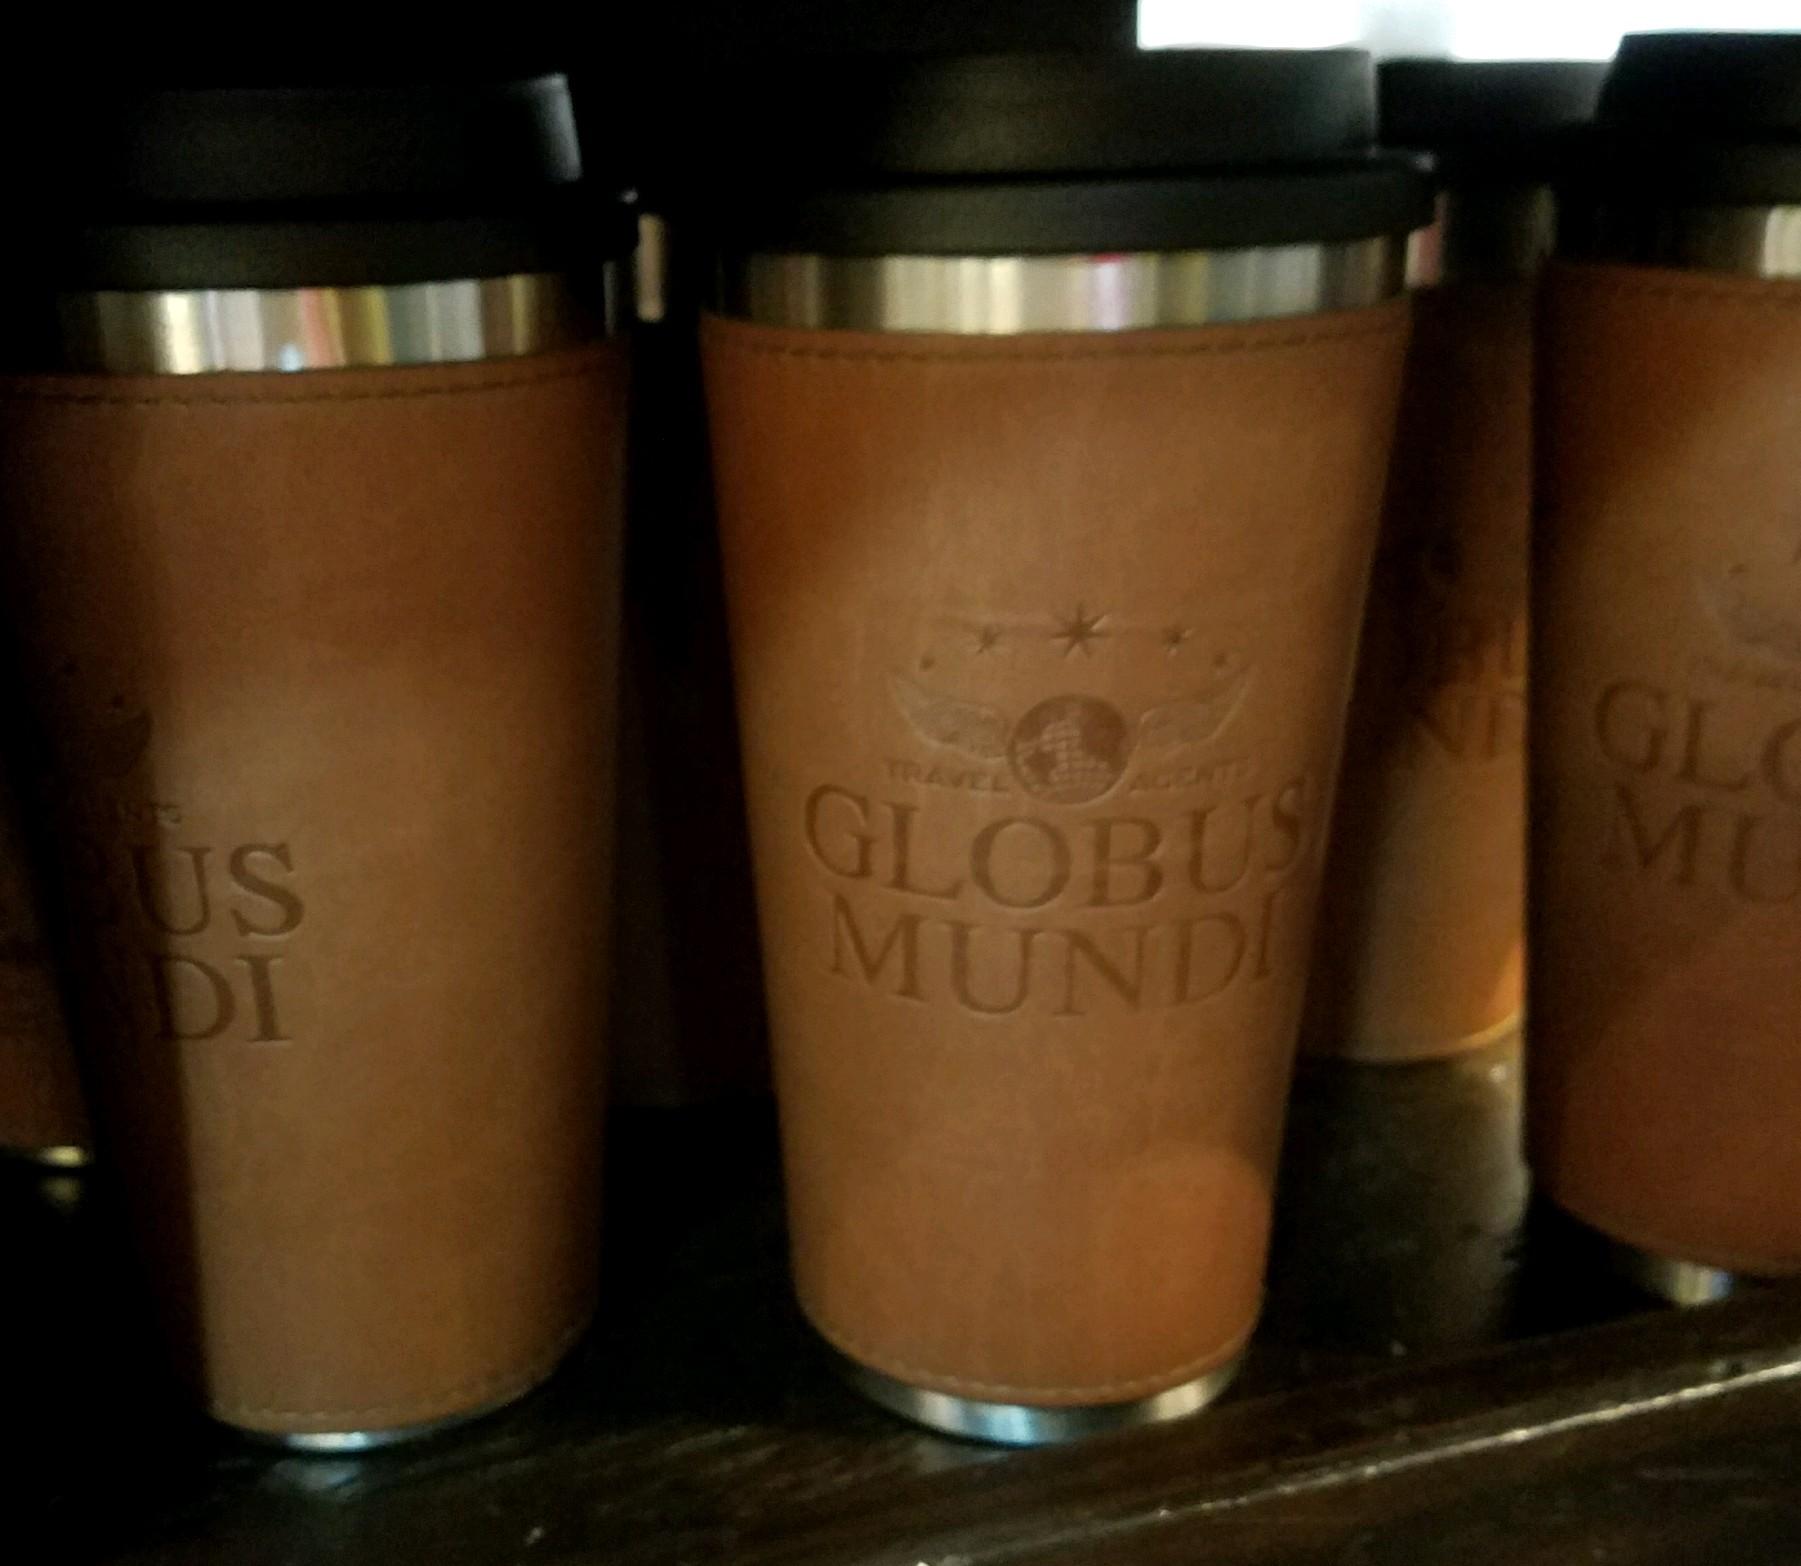 Globus Mundi mug